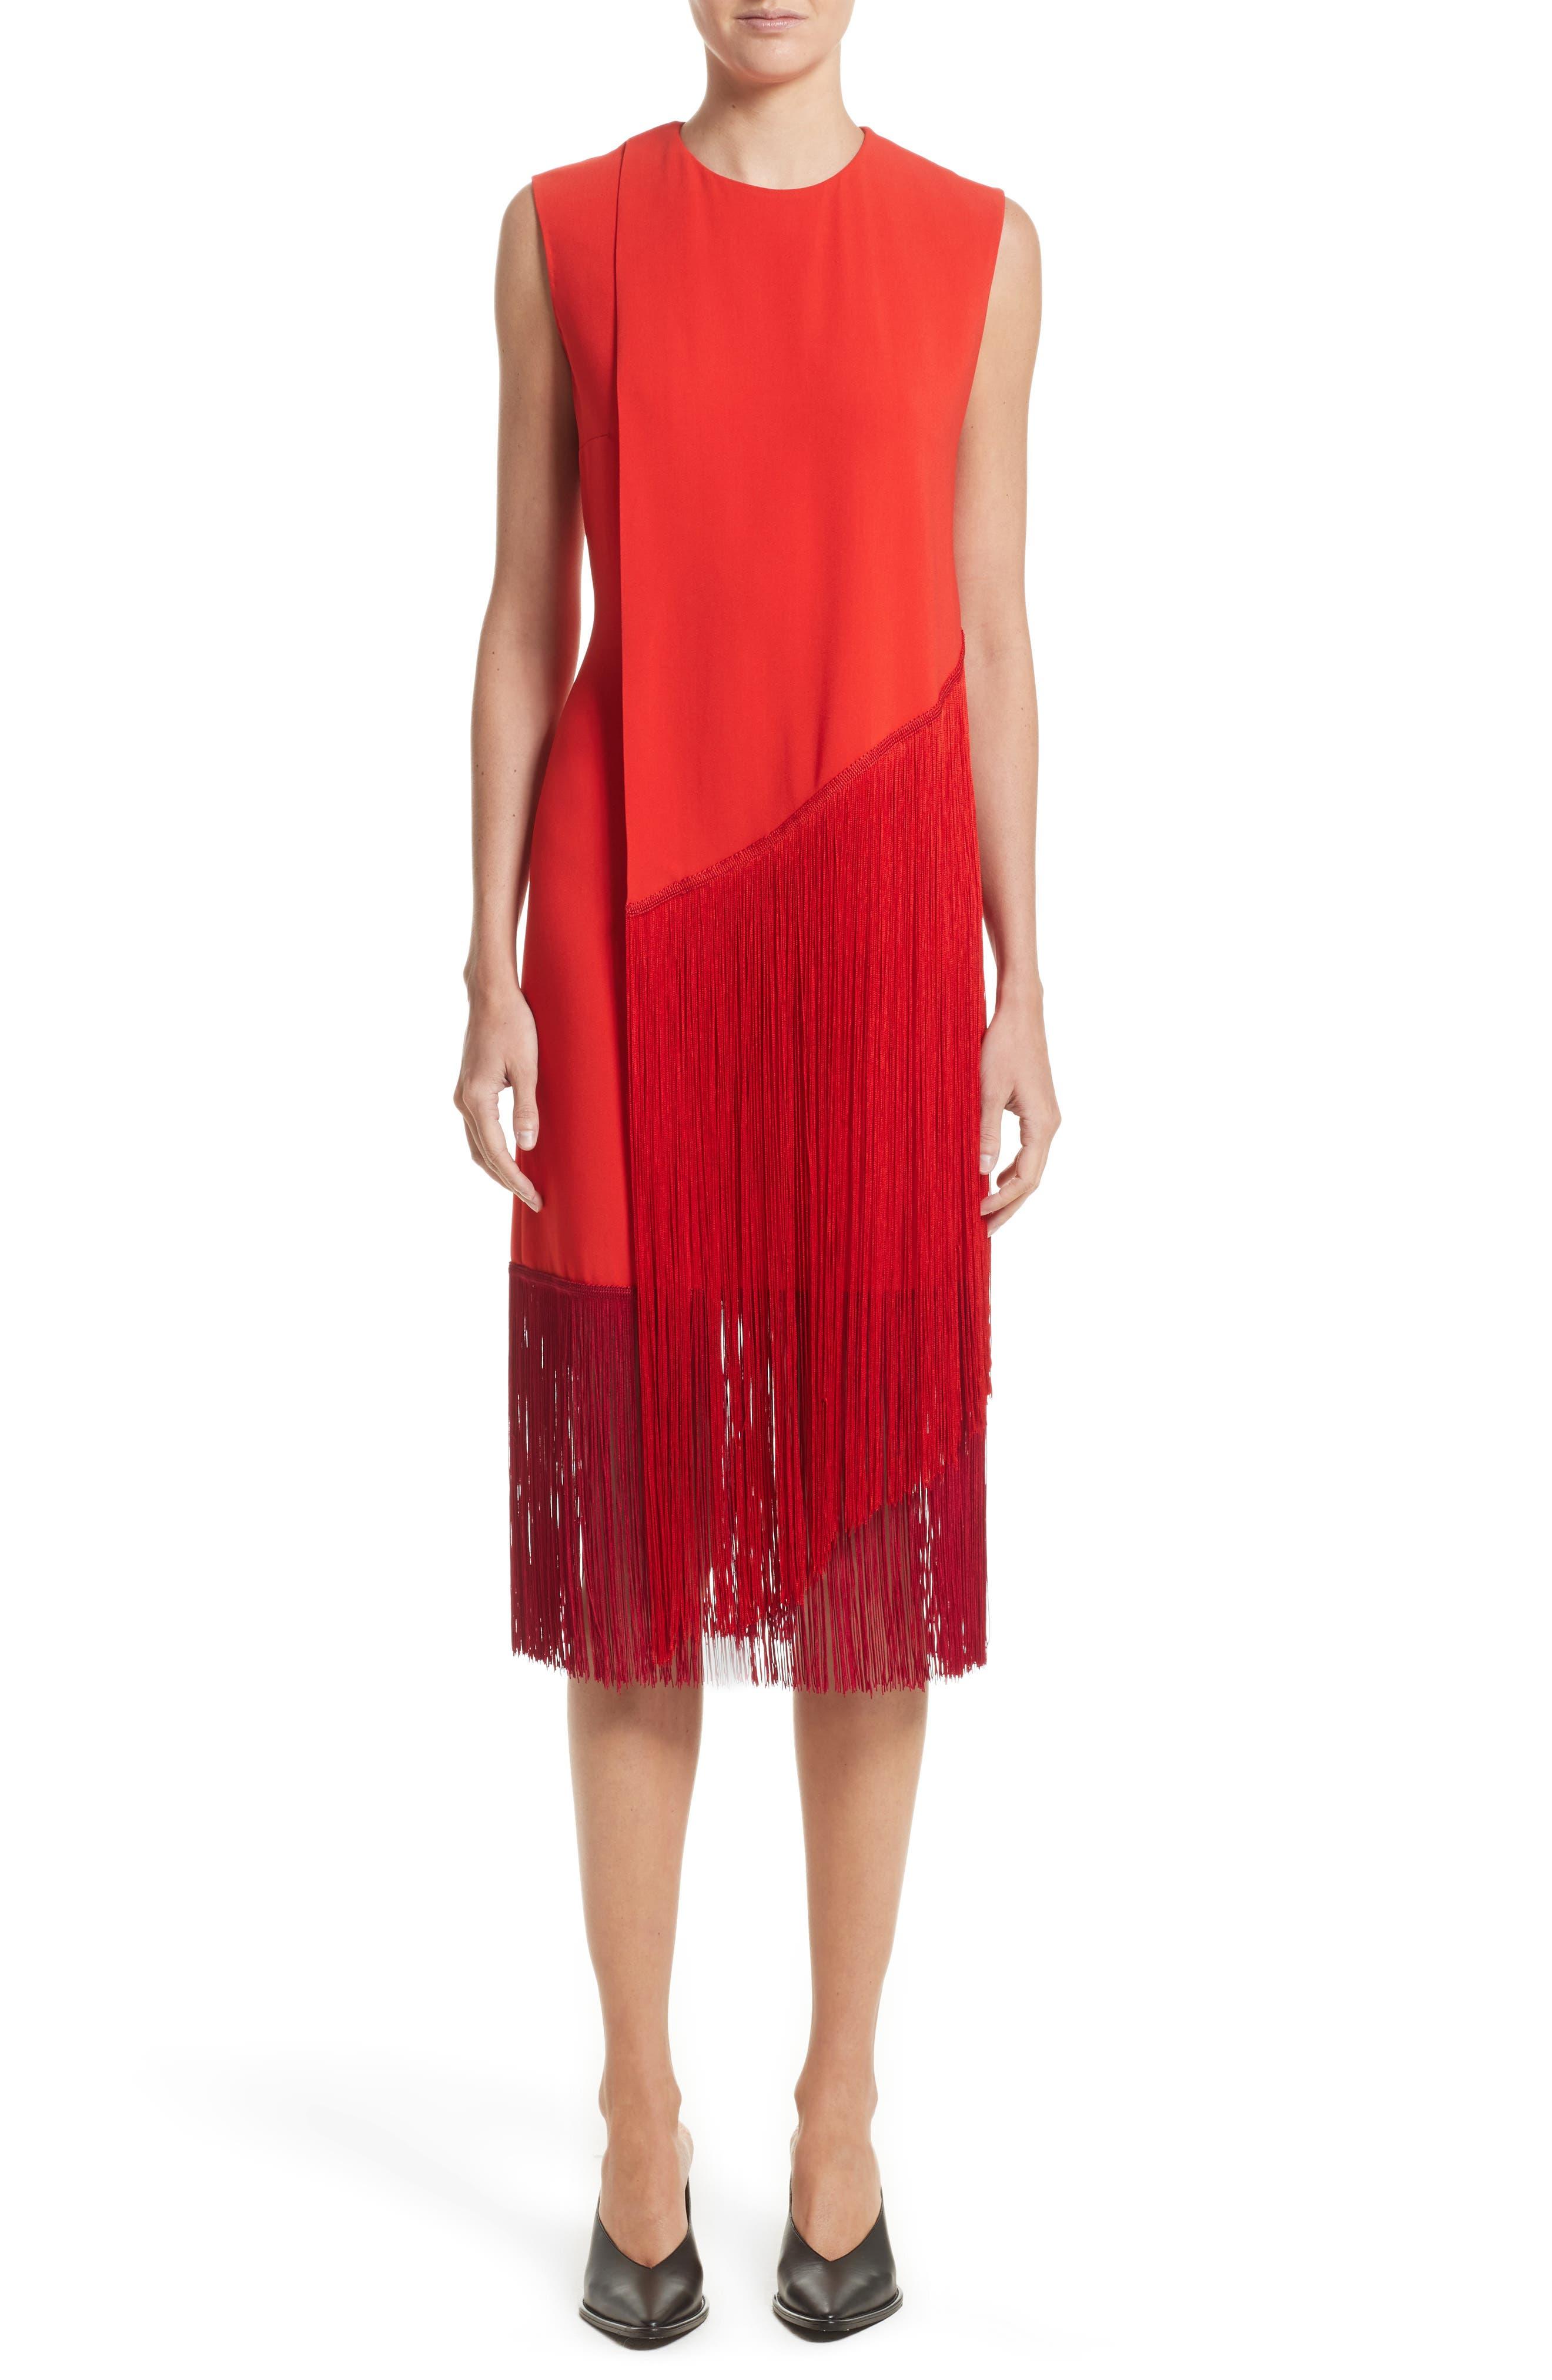 Stella McCartney Fringe Overlay Dress